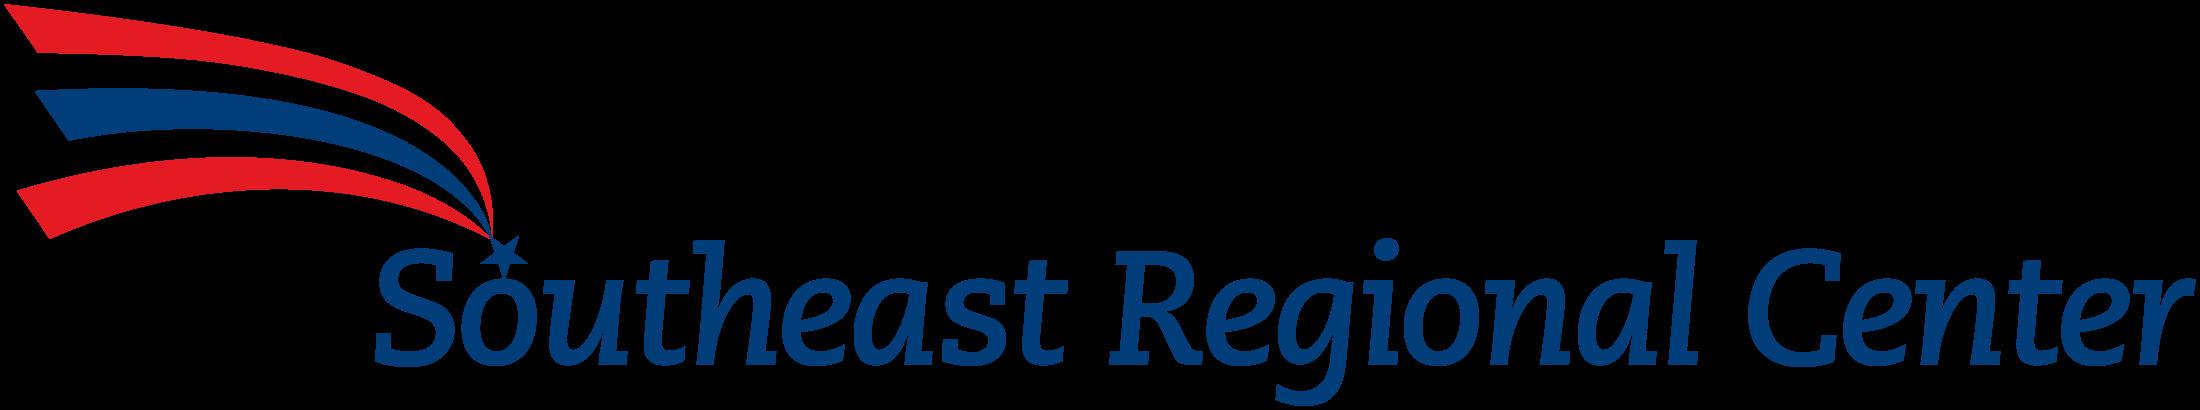 Southeast Regional Center